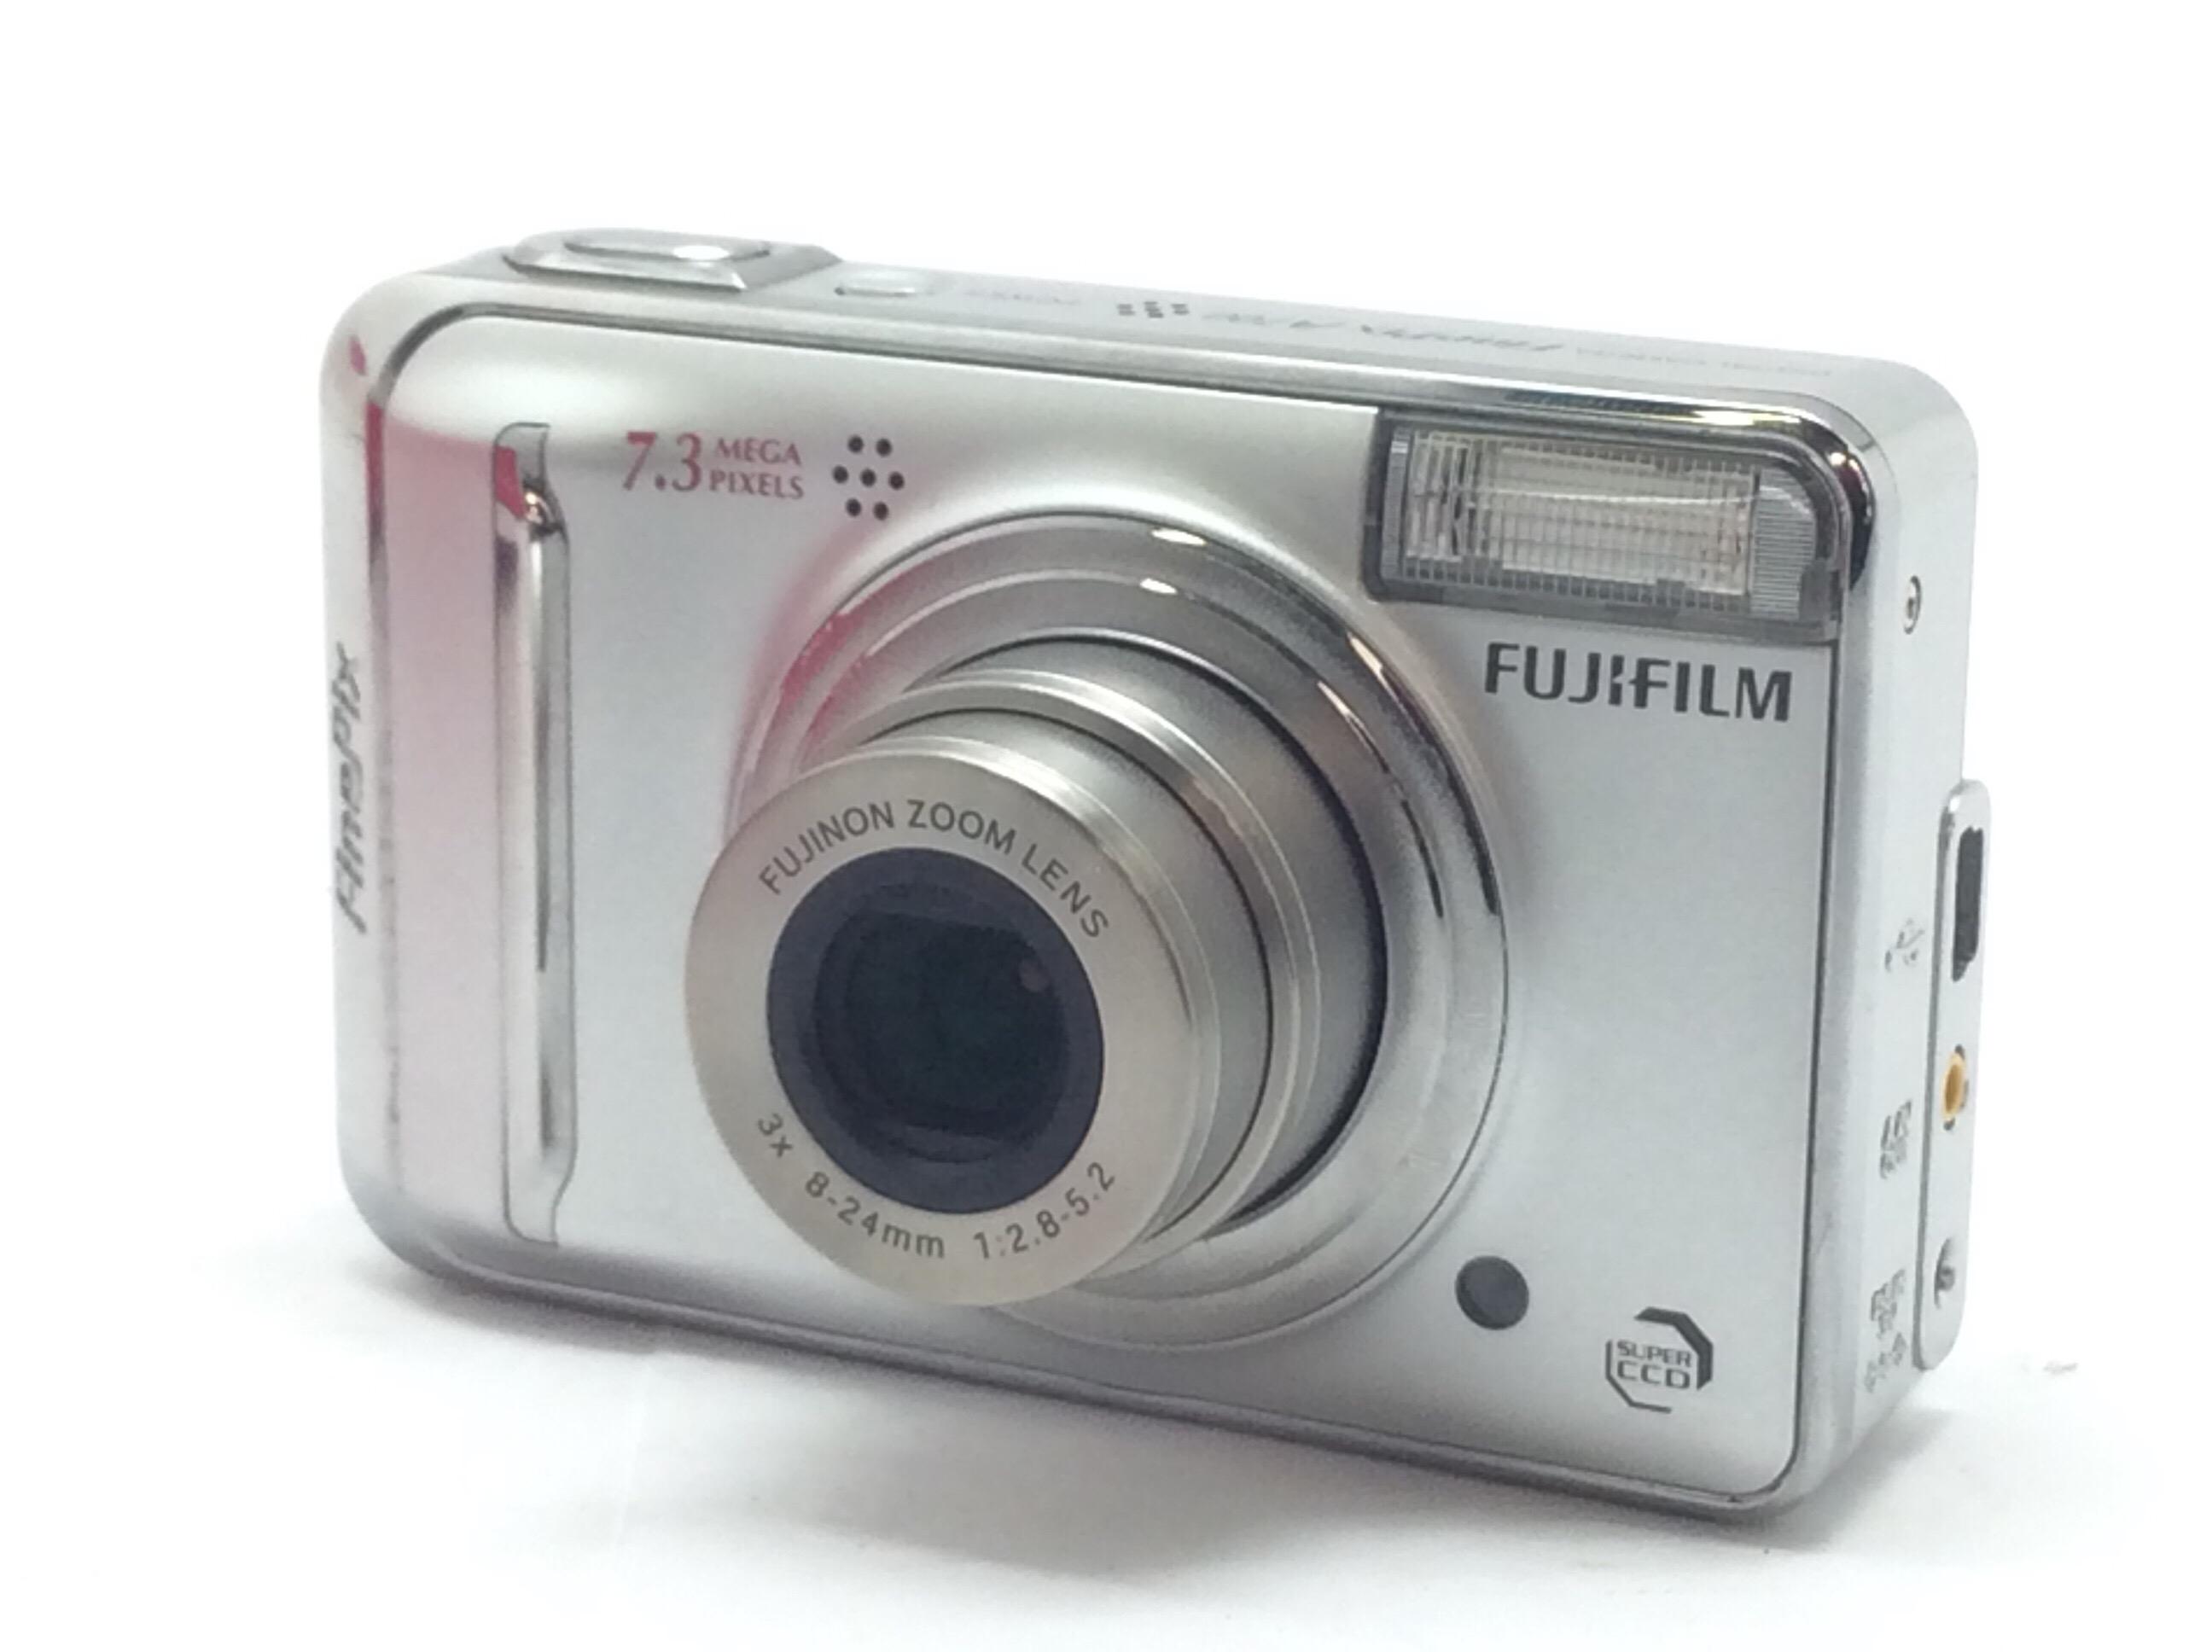 CAMARA DIGITAL COMPACTA FUJIFILM A700